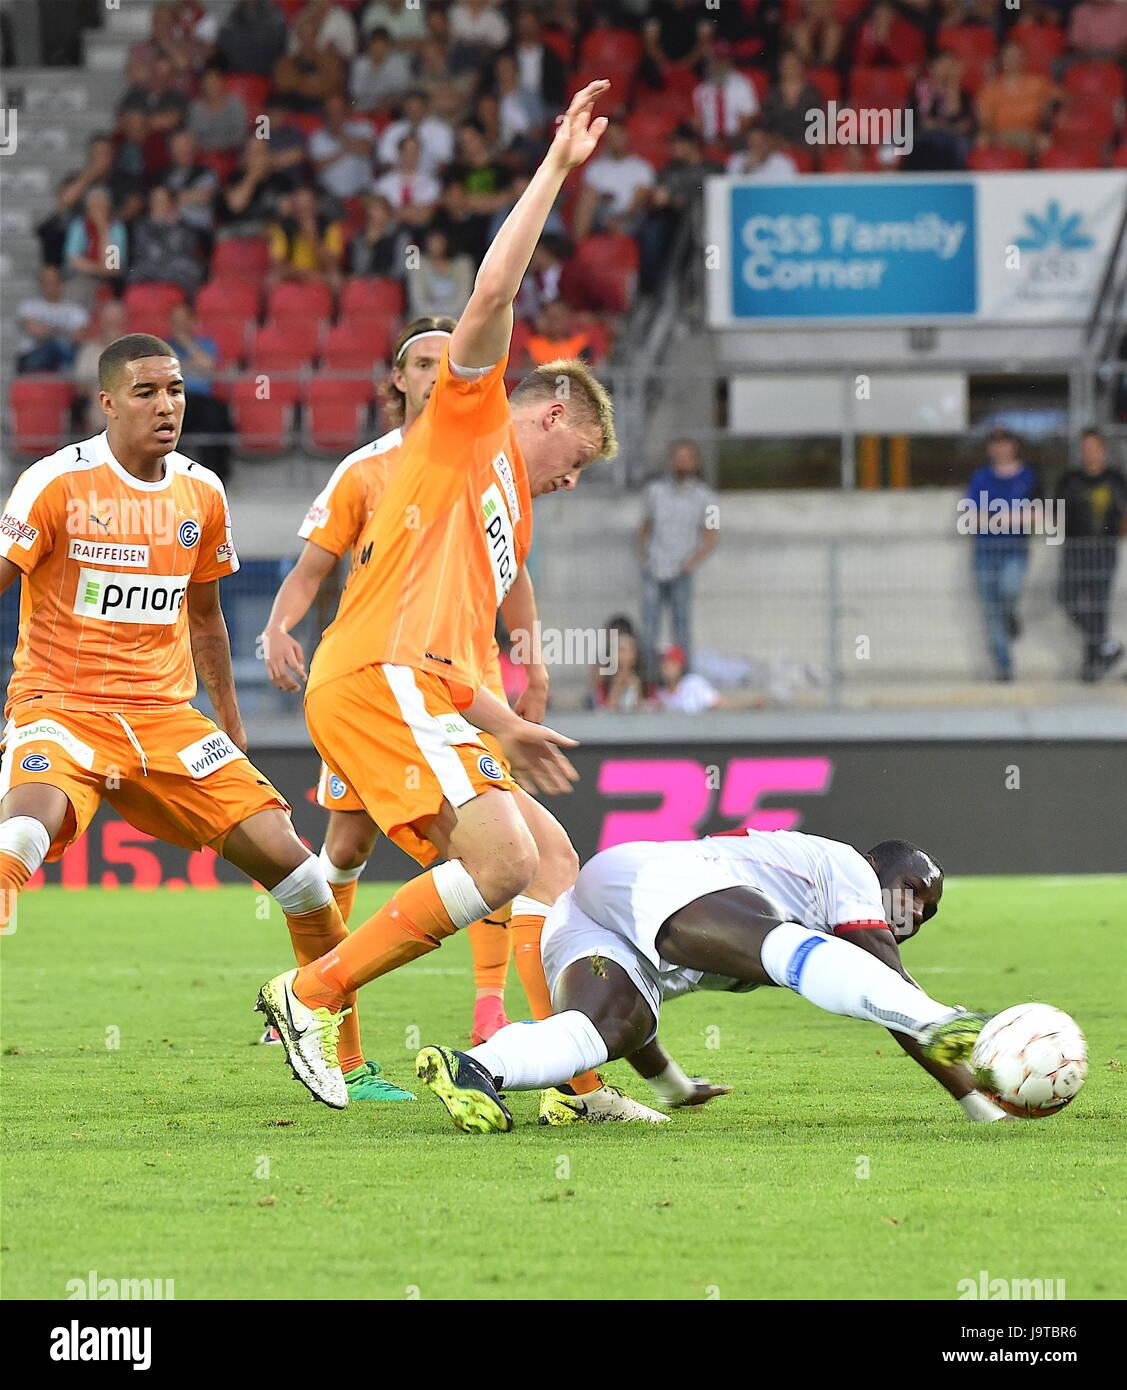 Sion, 02.06.2017, Football Raiffeisen Super League, FC Sion - Grasshoppers Club Zurich, Moussa Konate (FC Sion 14) - Stock Image